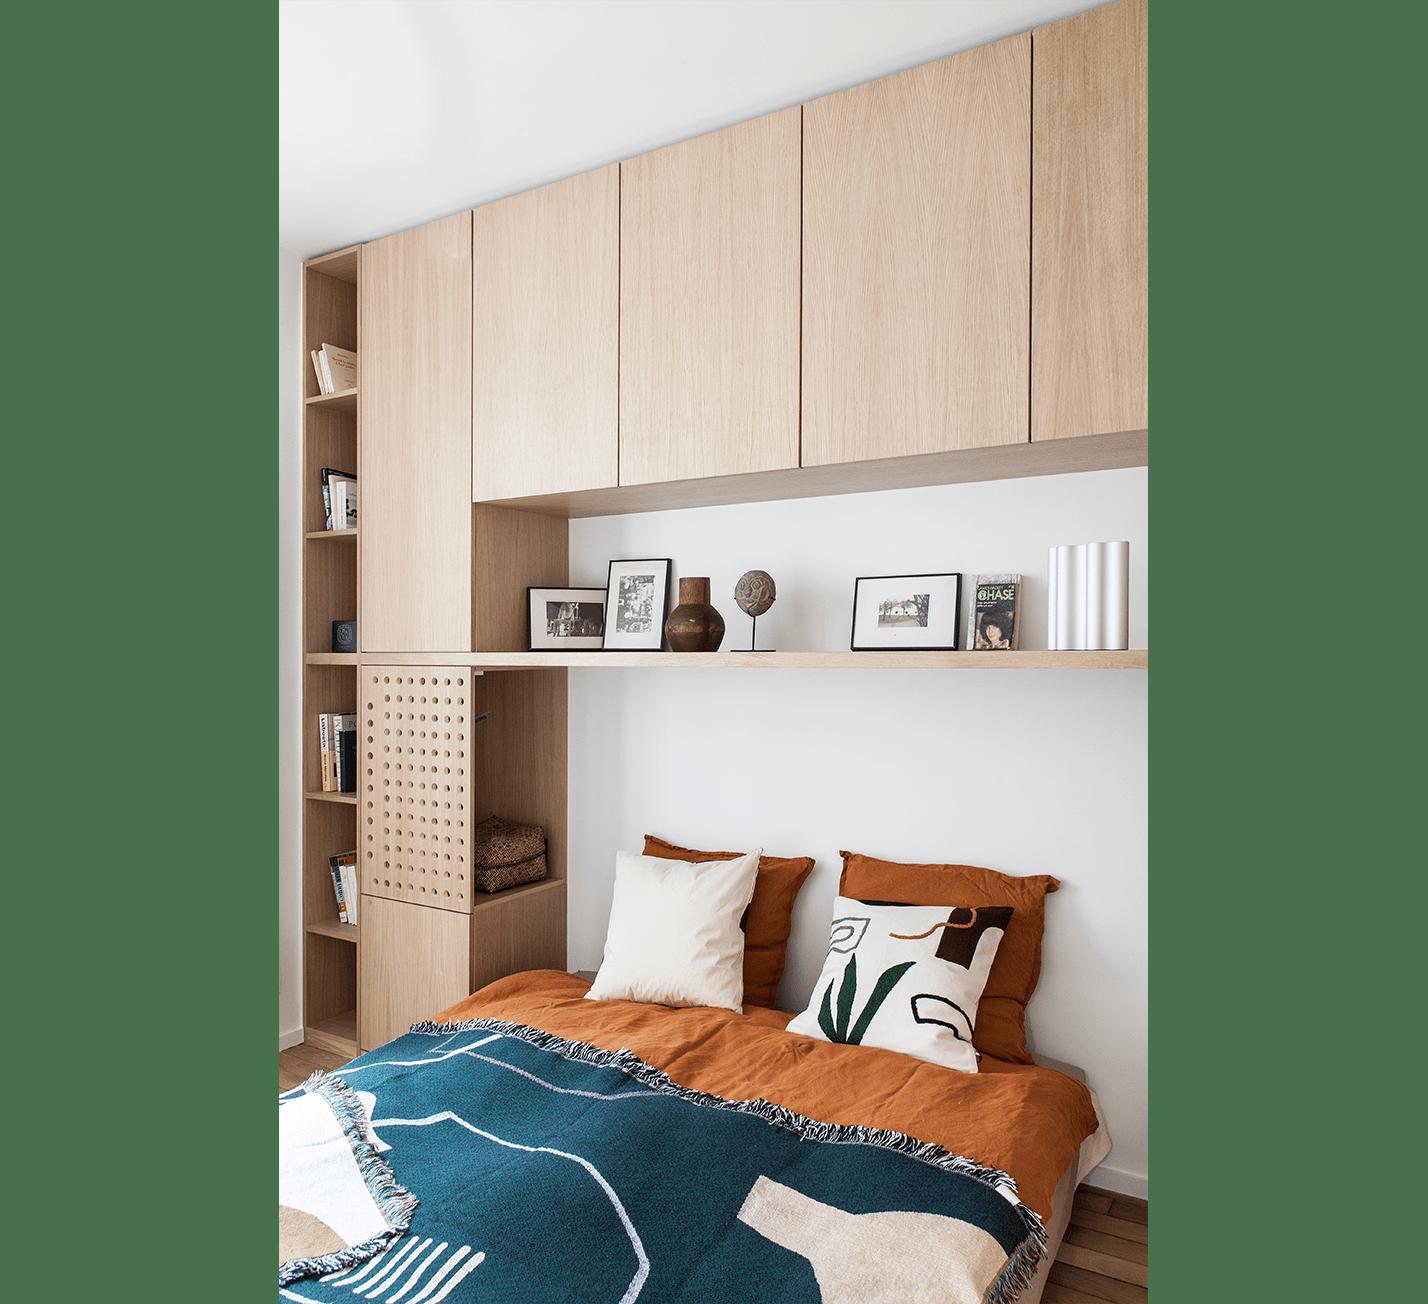 Projet-Cavallotti-Atelier-Steve-Pauline-Borgia-Architecte-interieur-08-min